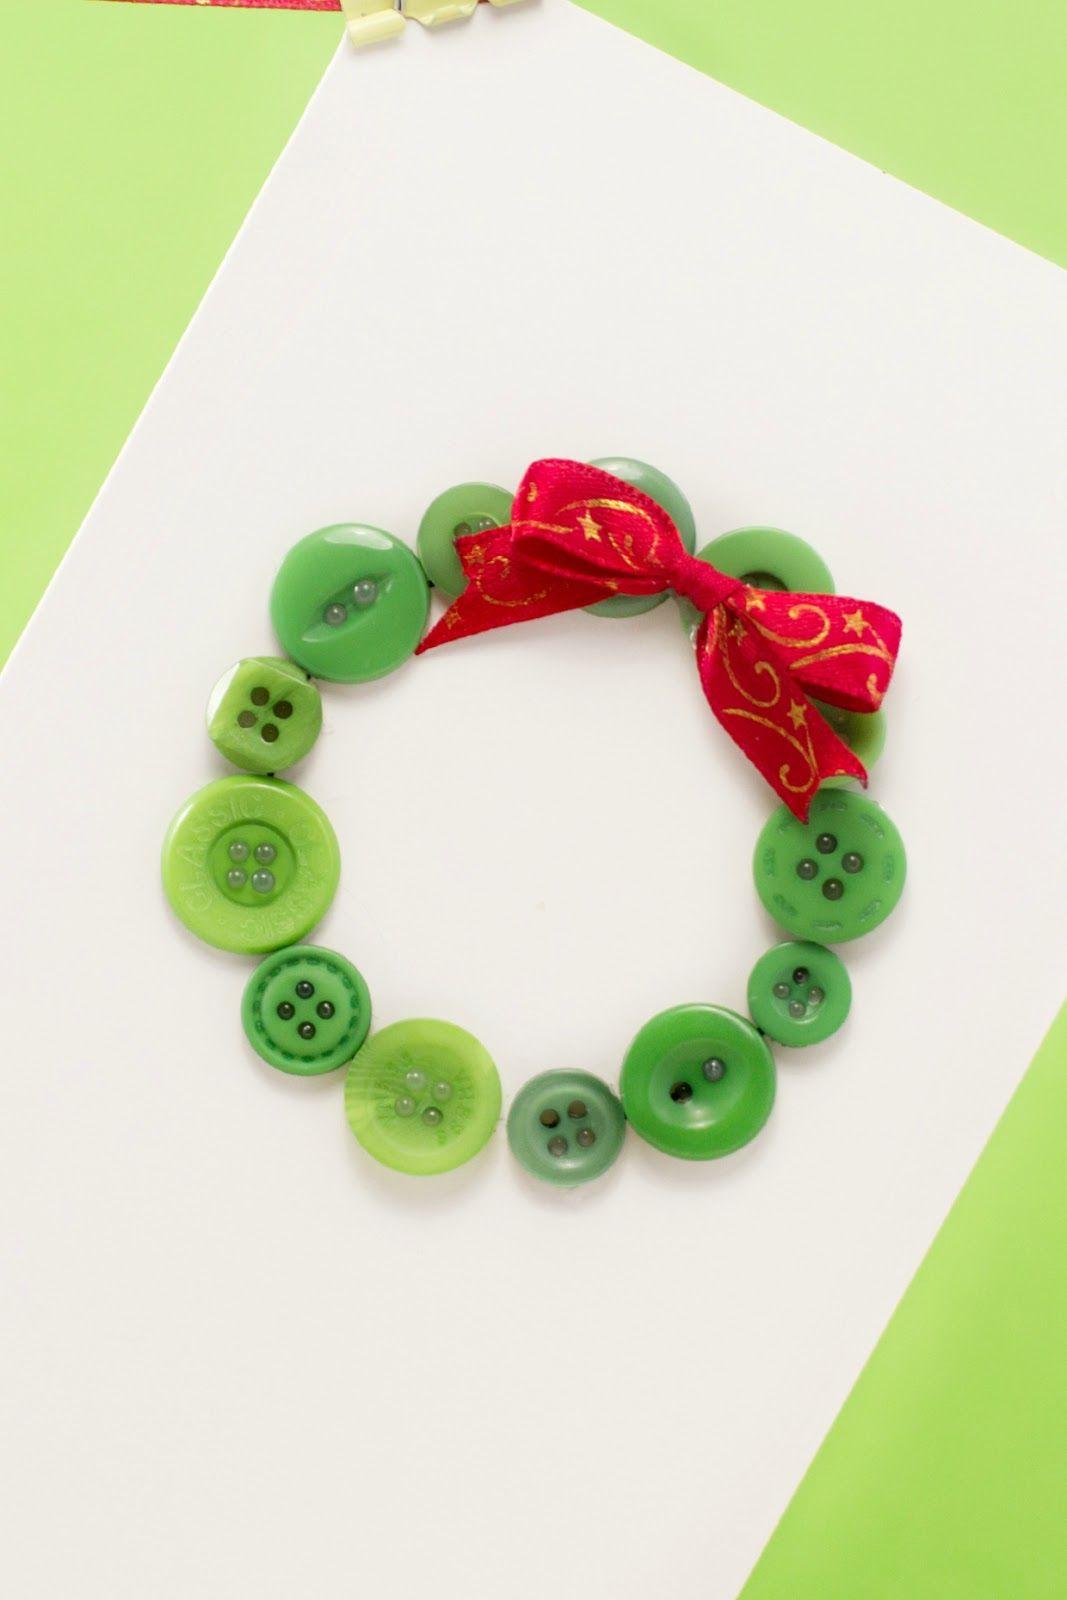 Easy To Make Christmas Cards Ideas Part - 44: Easy DIY Button Christmas Card Via Hopeful Honey